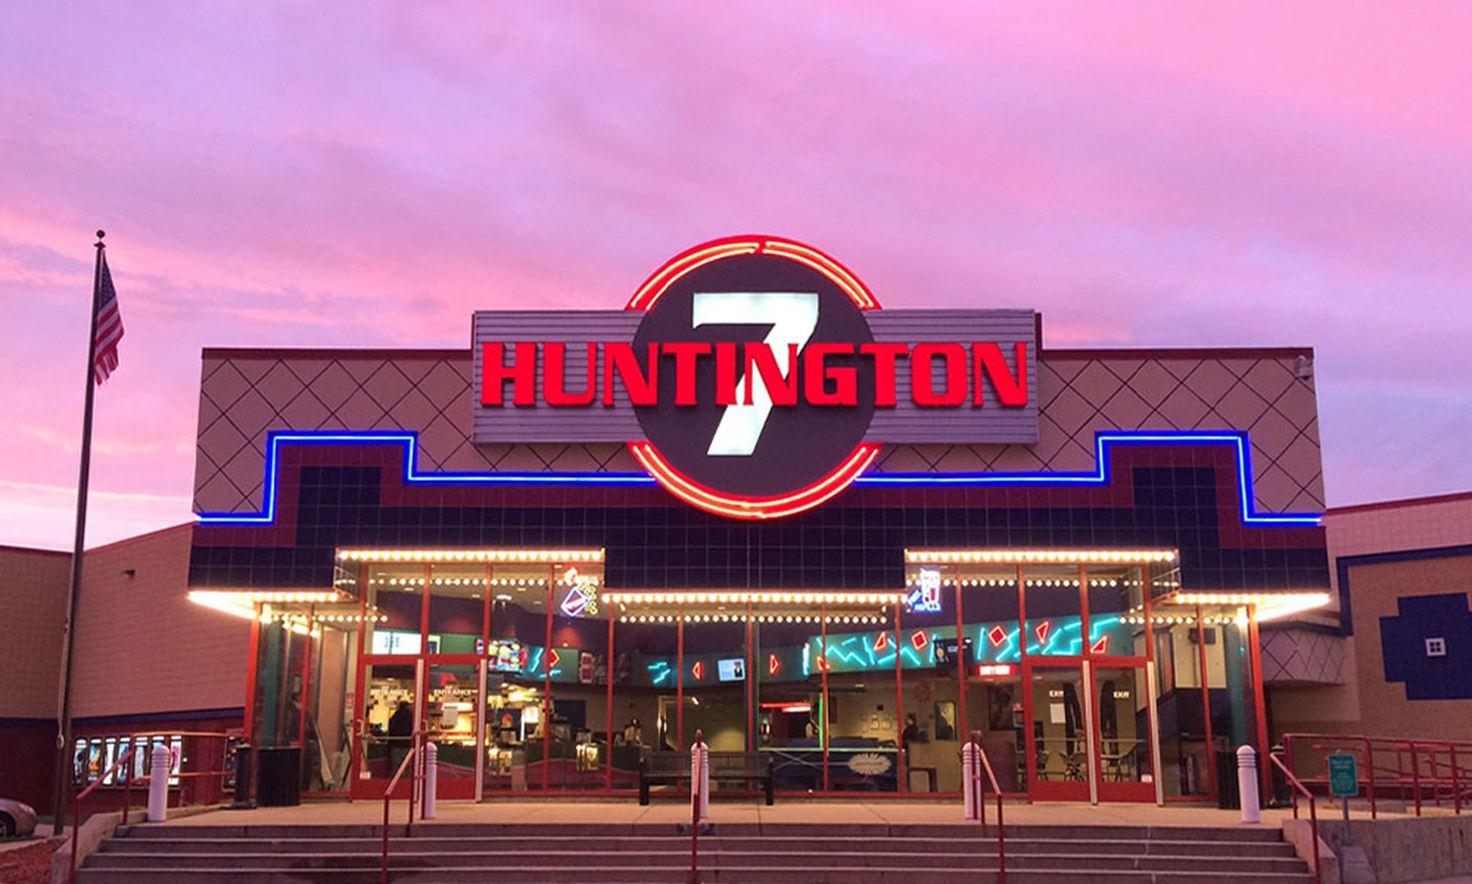 GQT Huntington 7